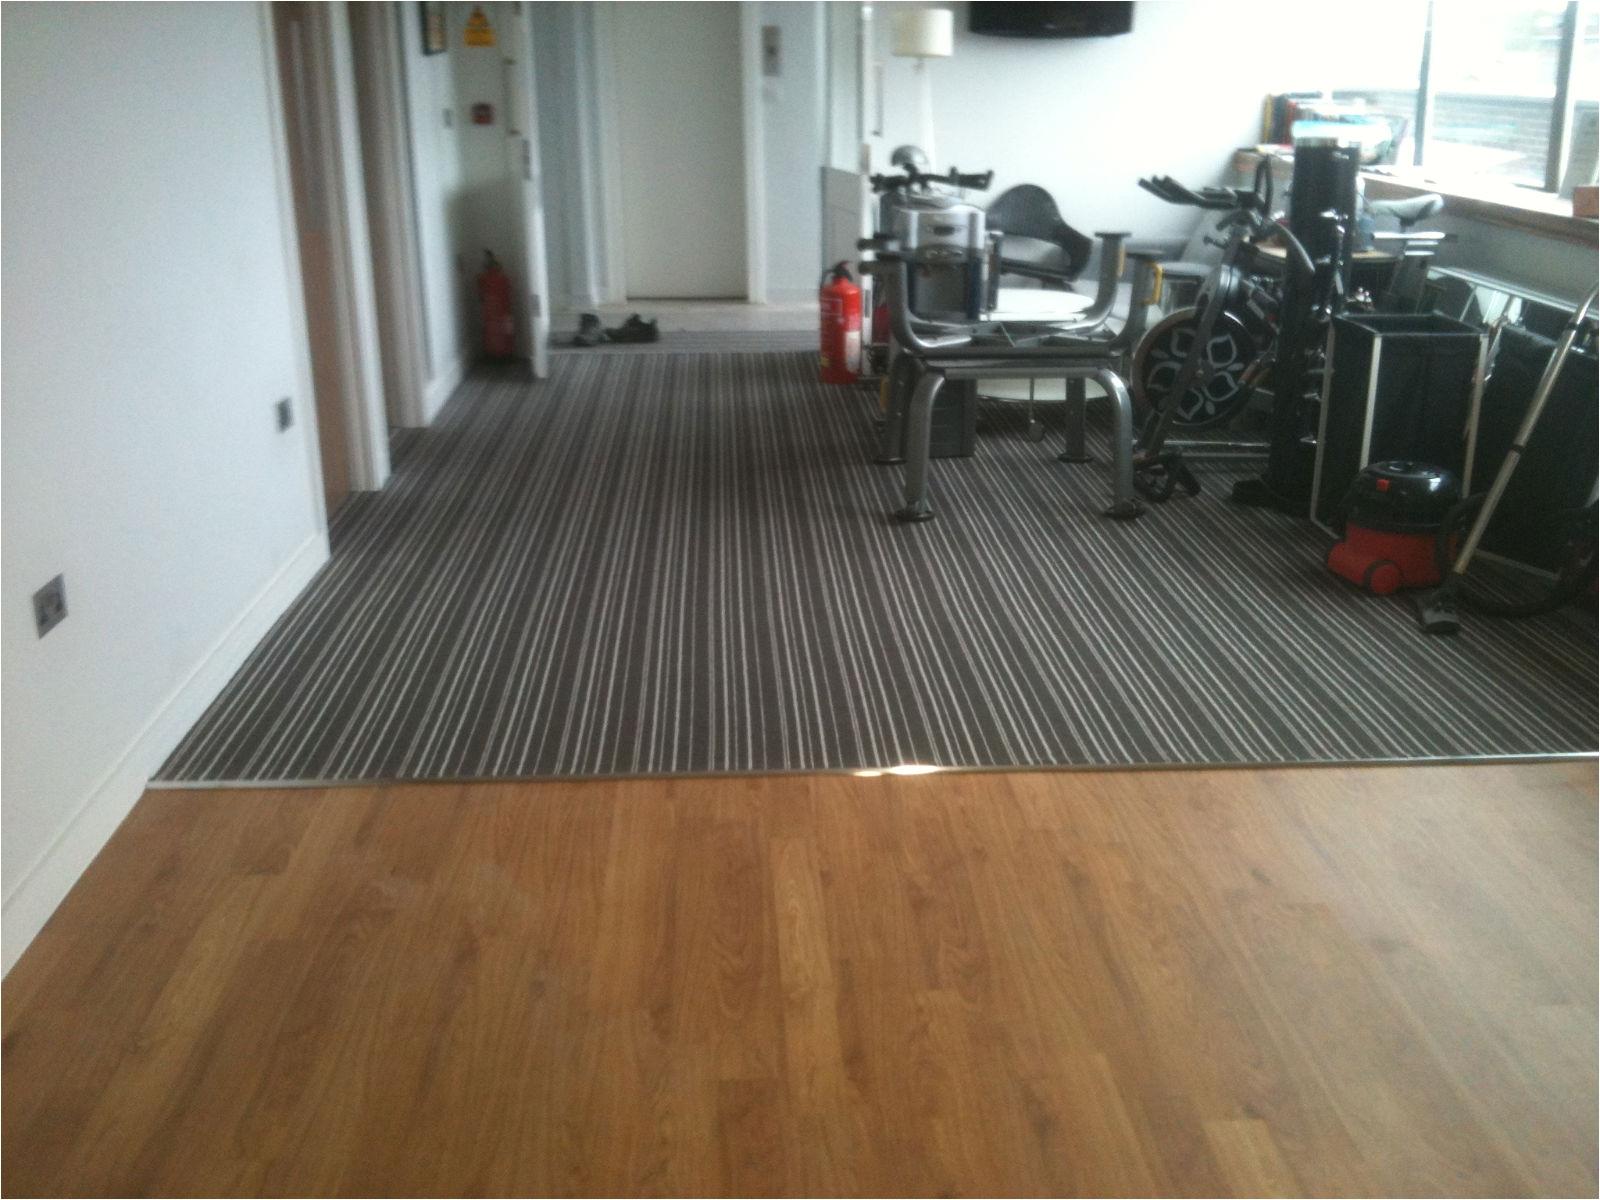 Rubber Flooring Tiles Uk Rubber Floor Tiles for Home Gym Floor Tile Decoration Ideas